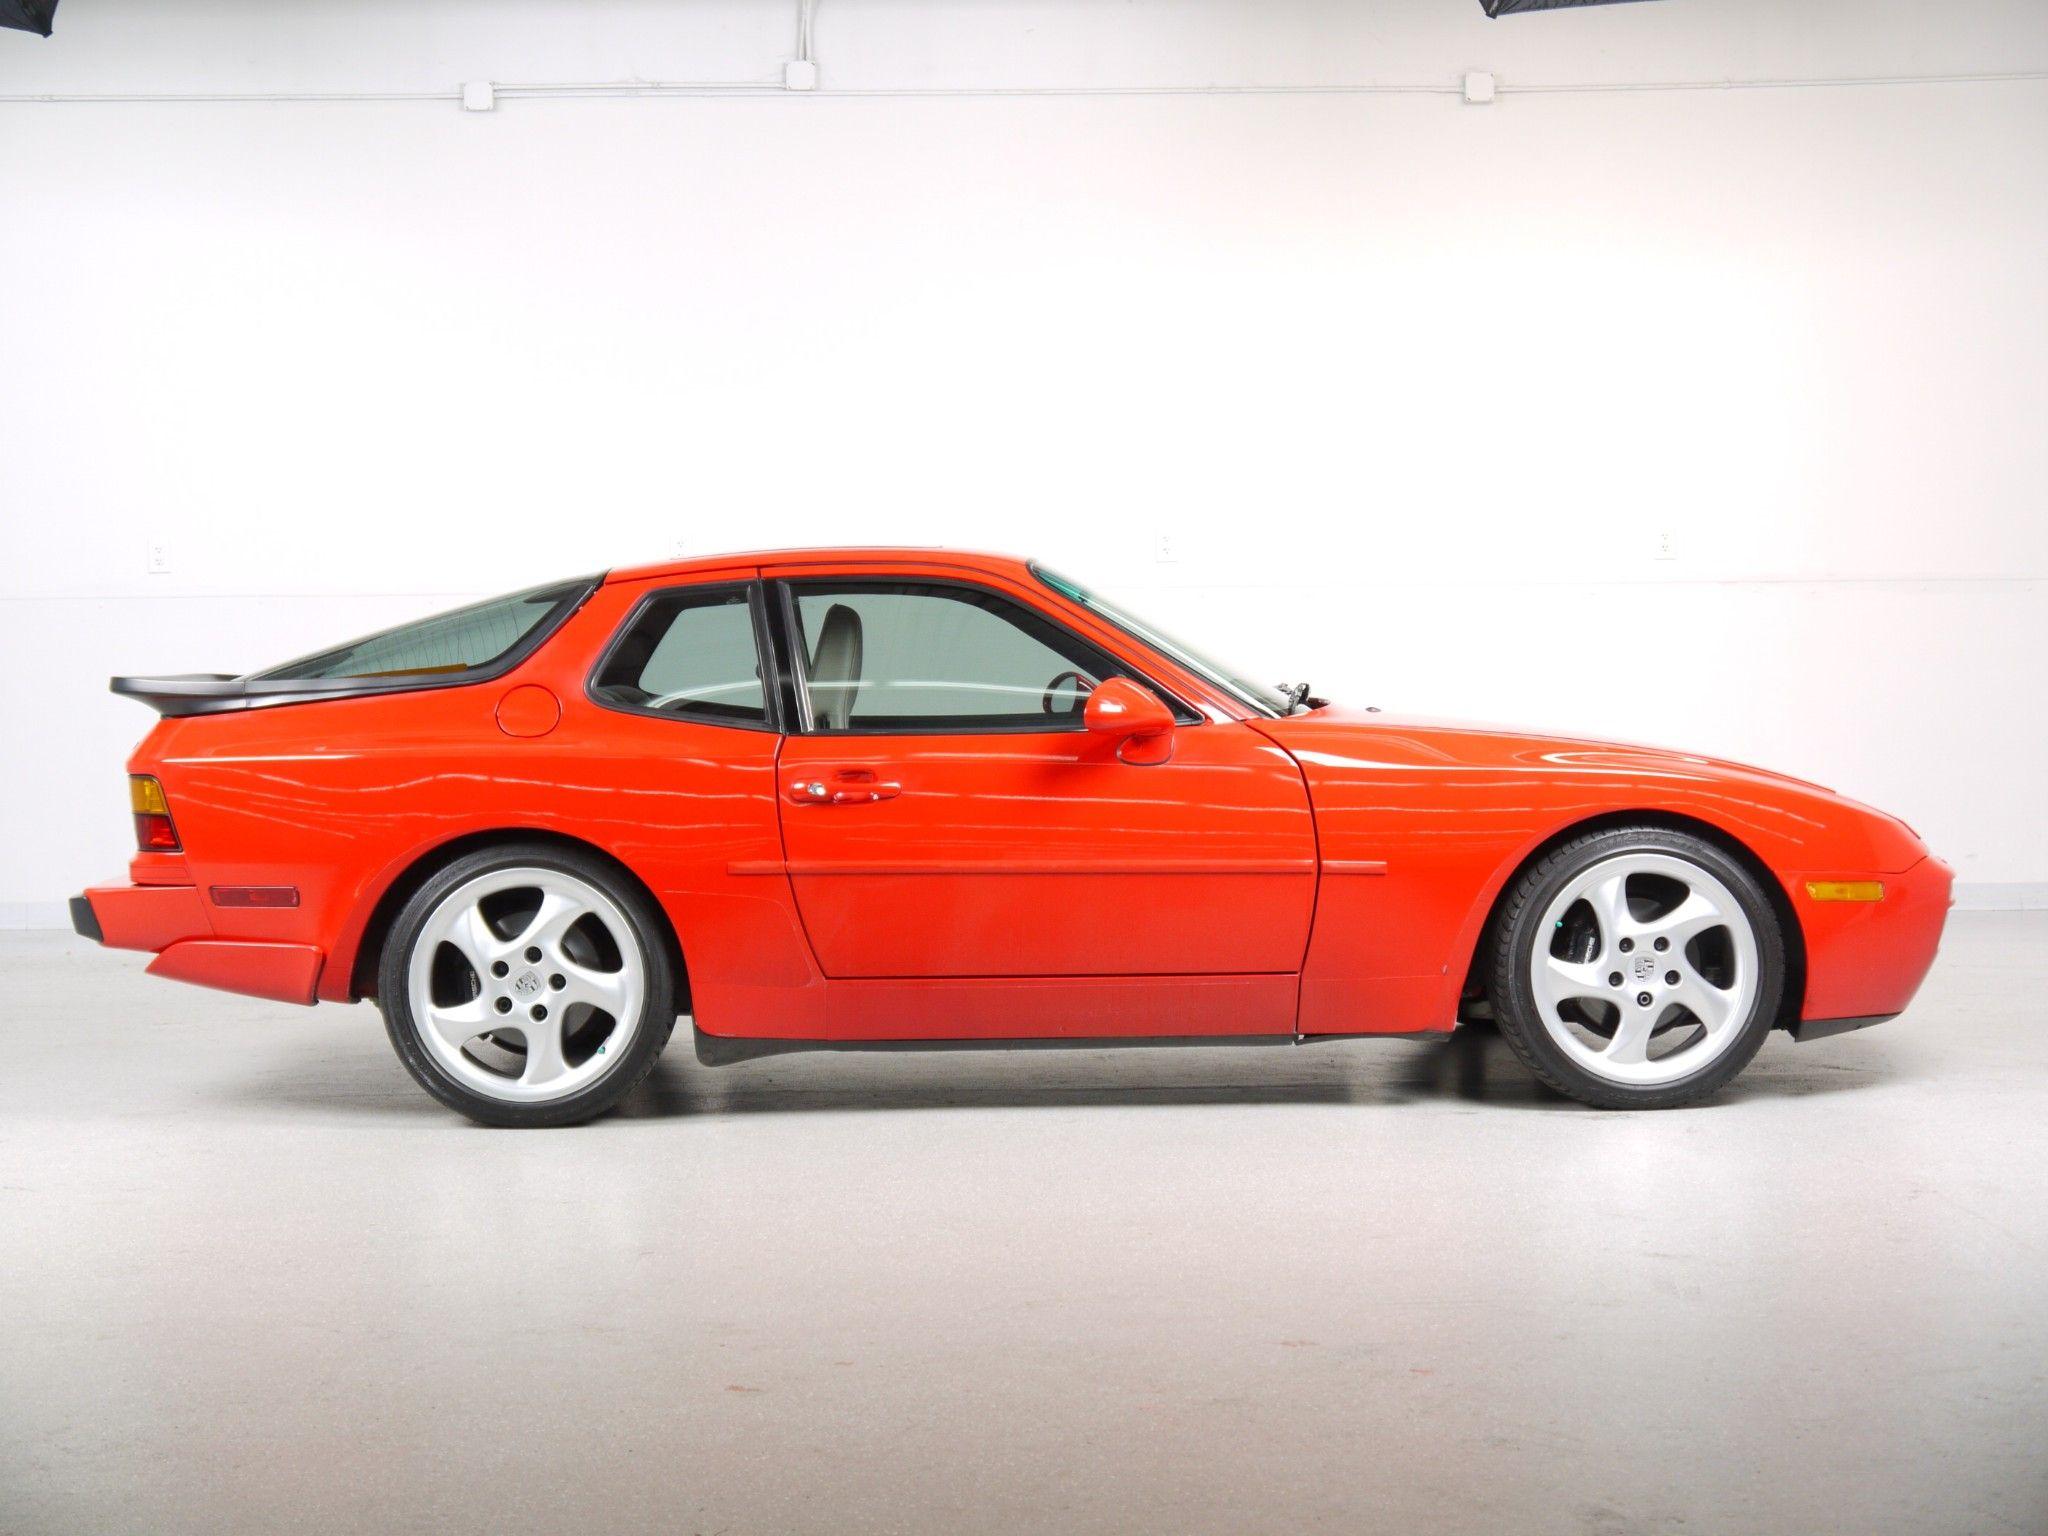 1987 Porsche 944 Turbo Porsche 944 Porsche Porsche 924